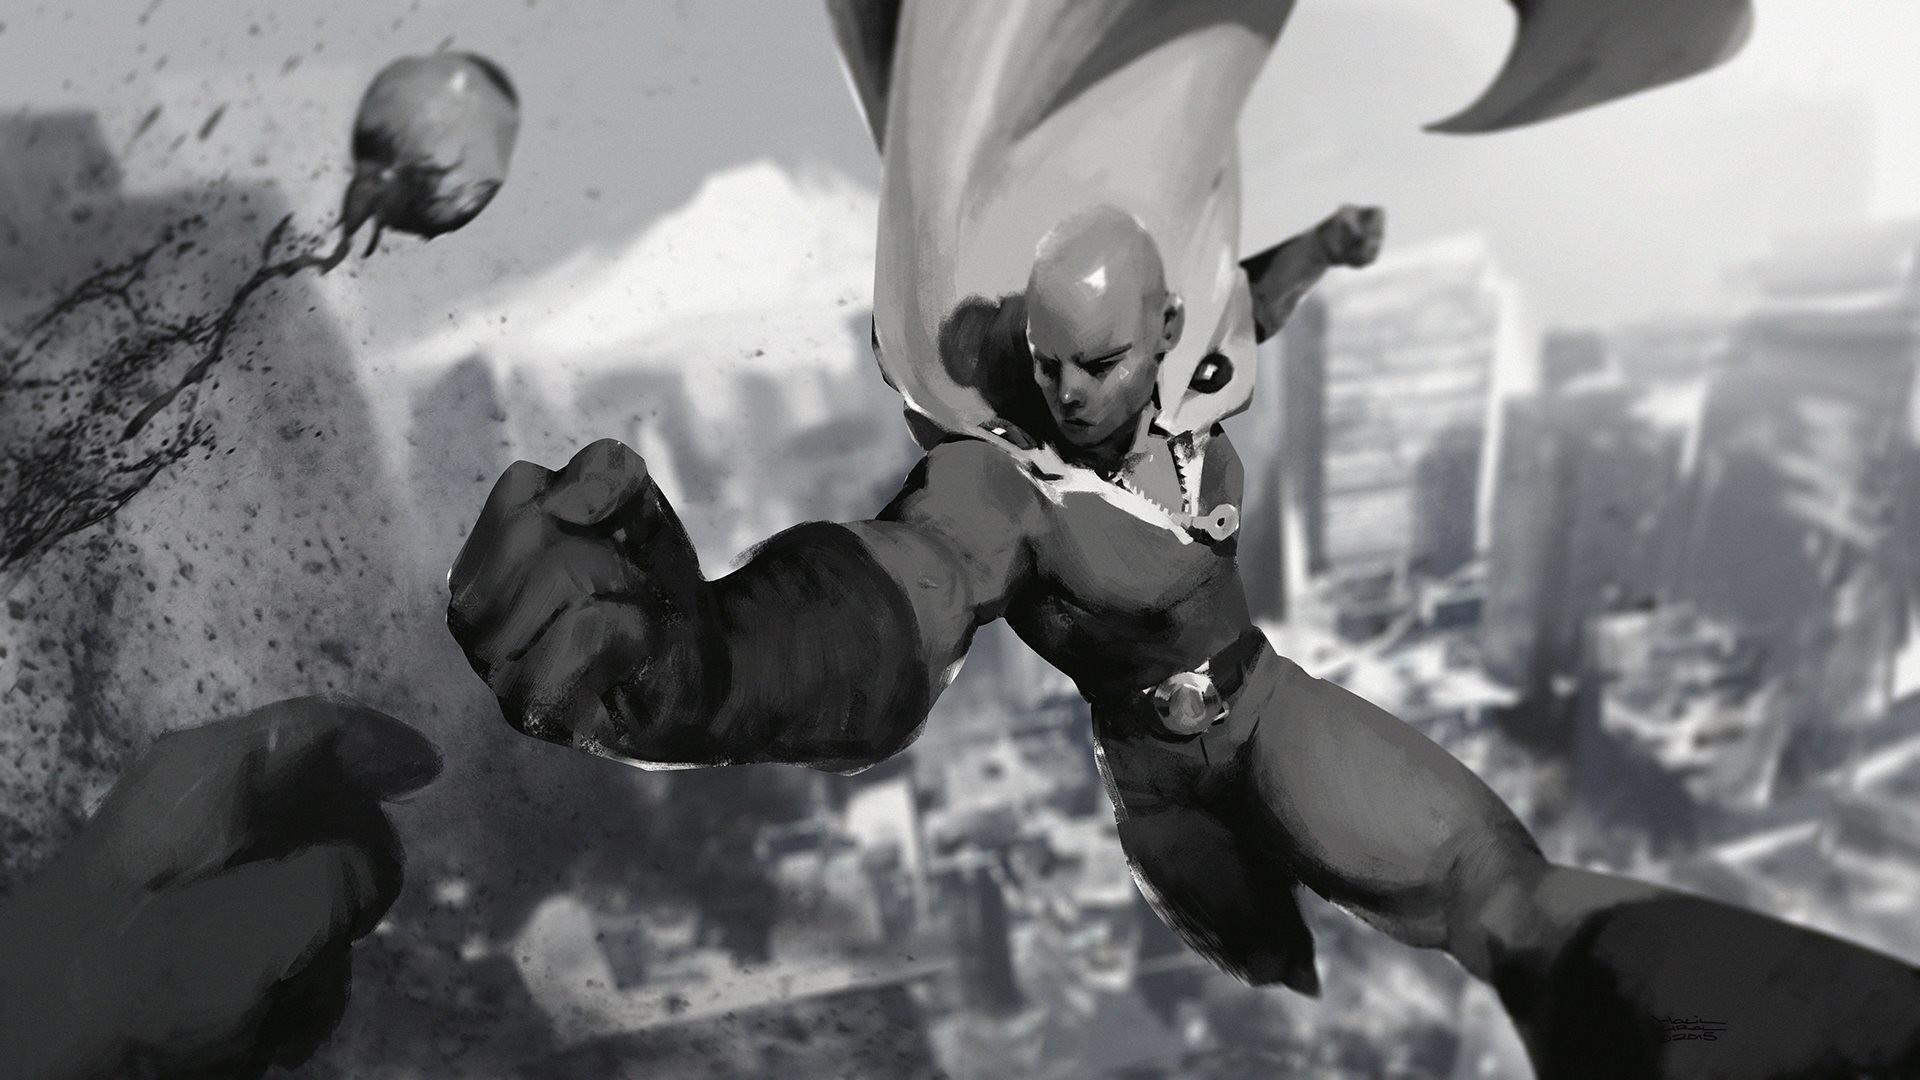 Anime – One-Punch Man Saitama (One-Punch Man) Bakgrund